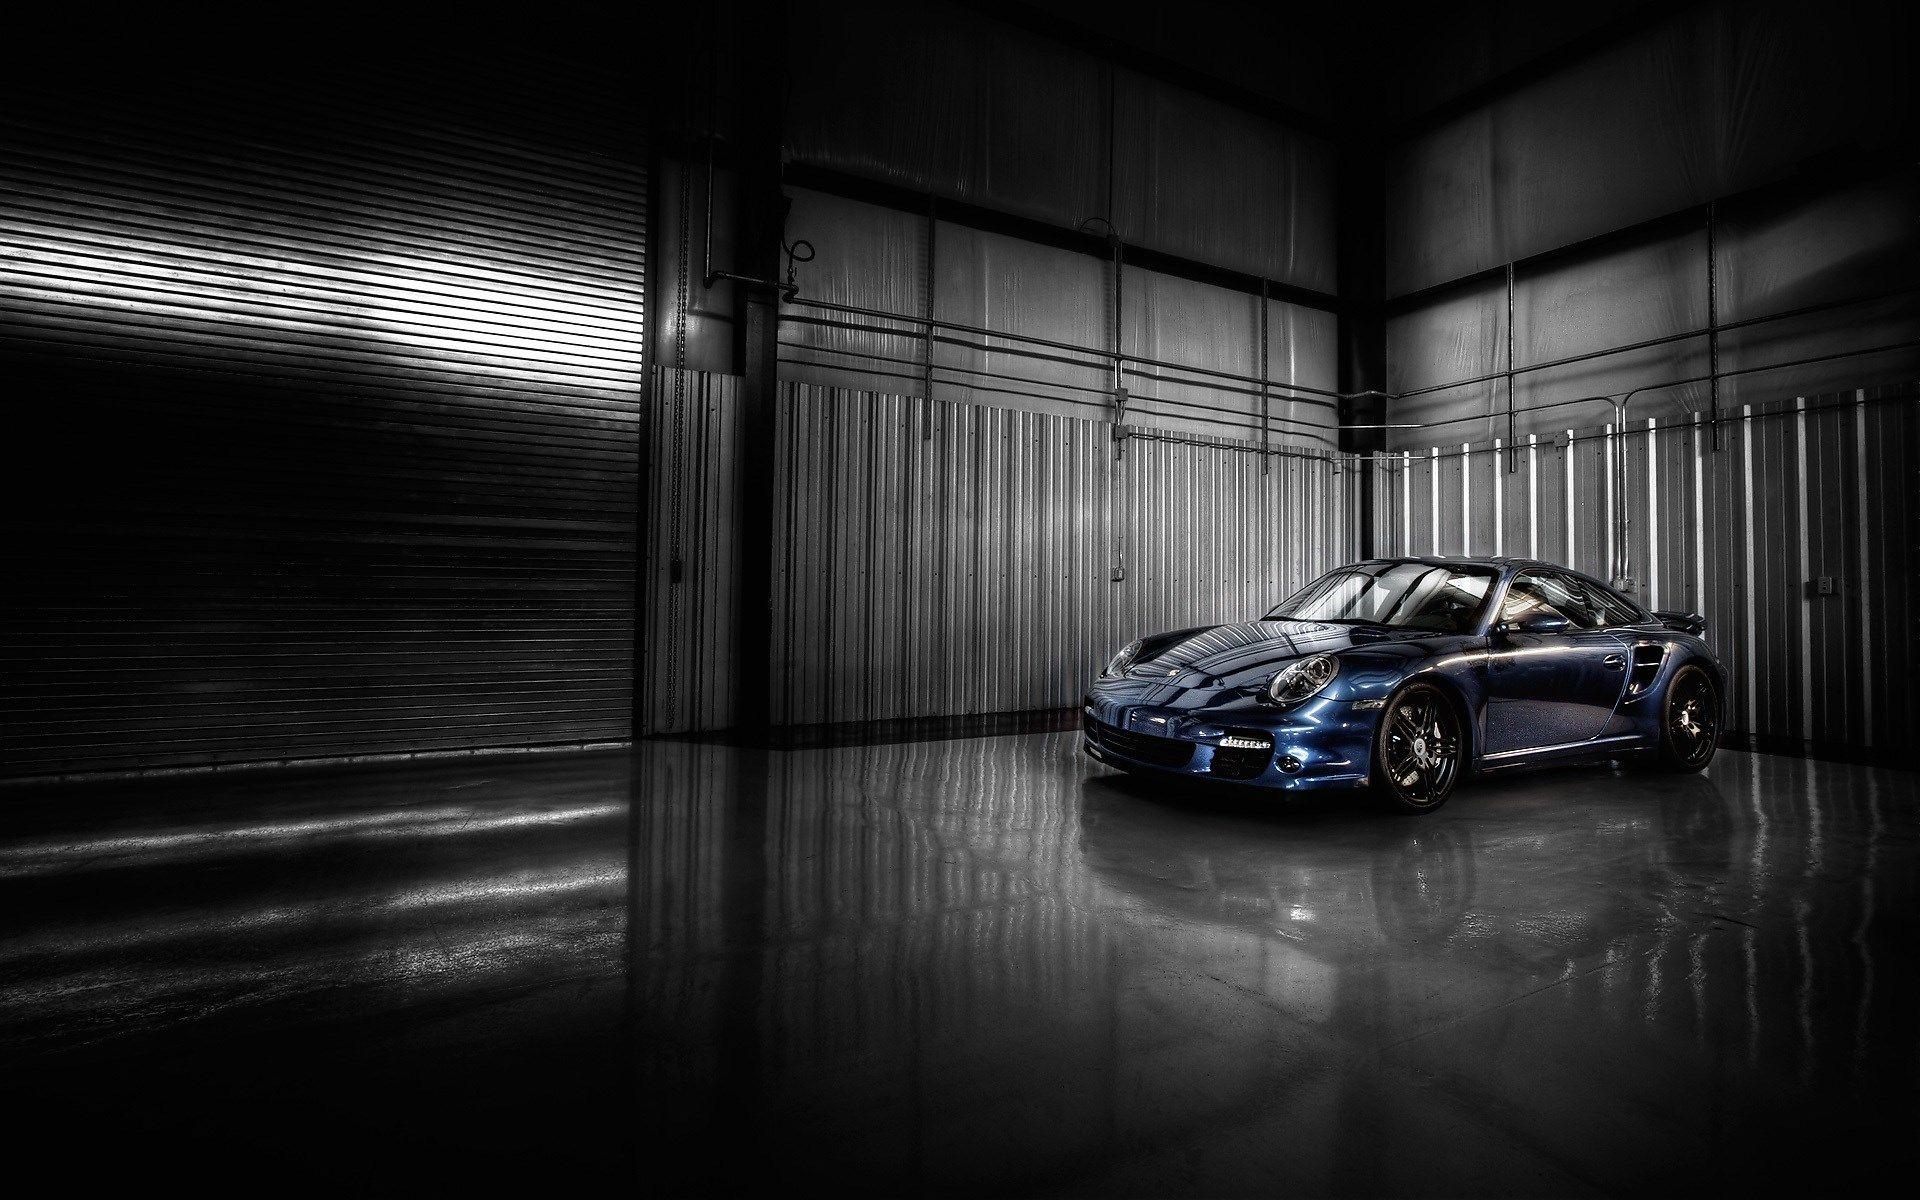 1920x1200 Beautiful Porsche Black Porsche Car Porsche